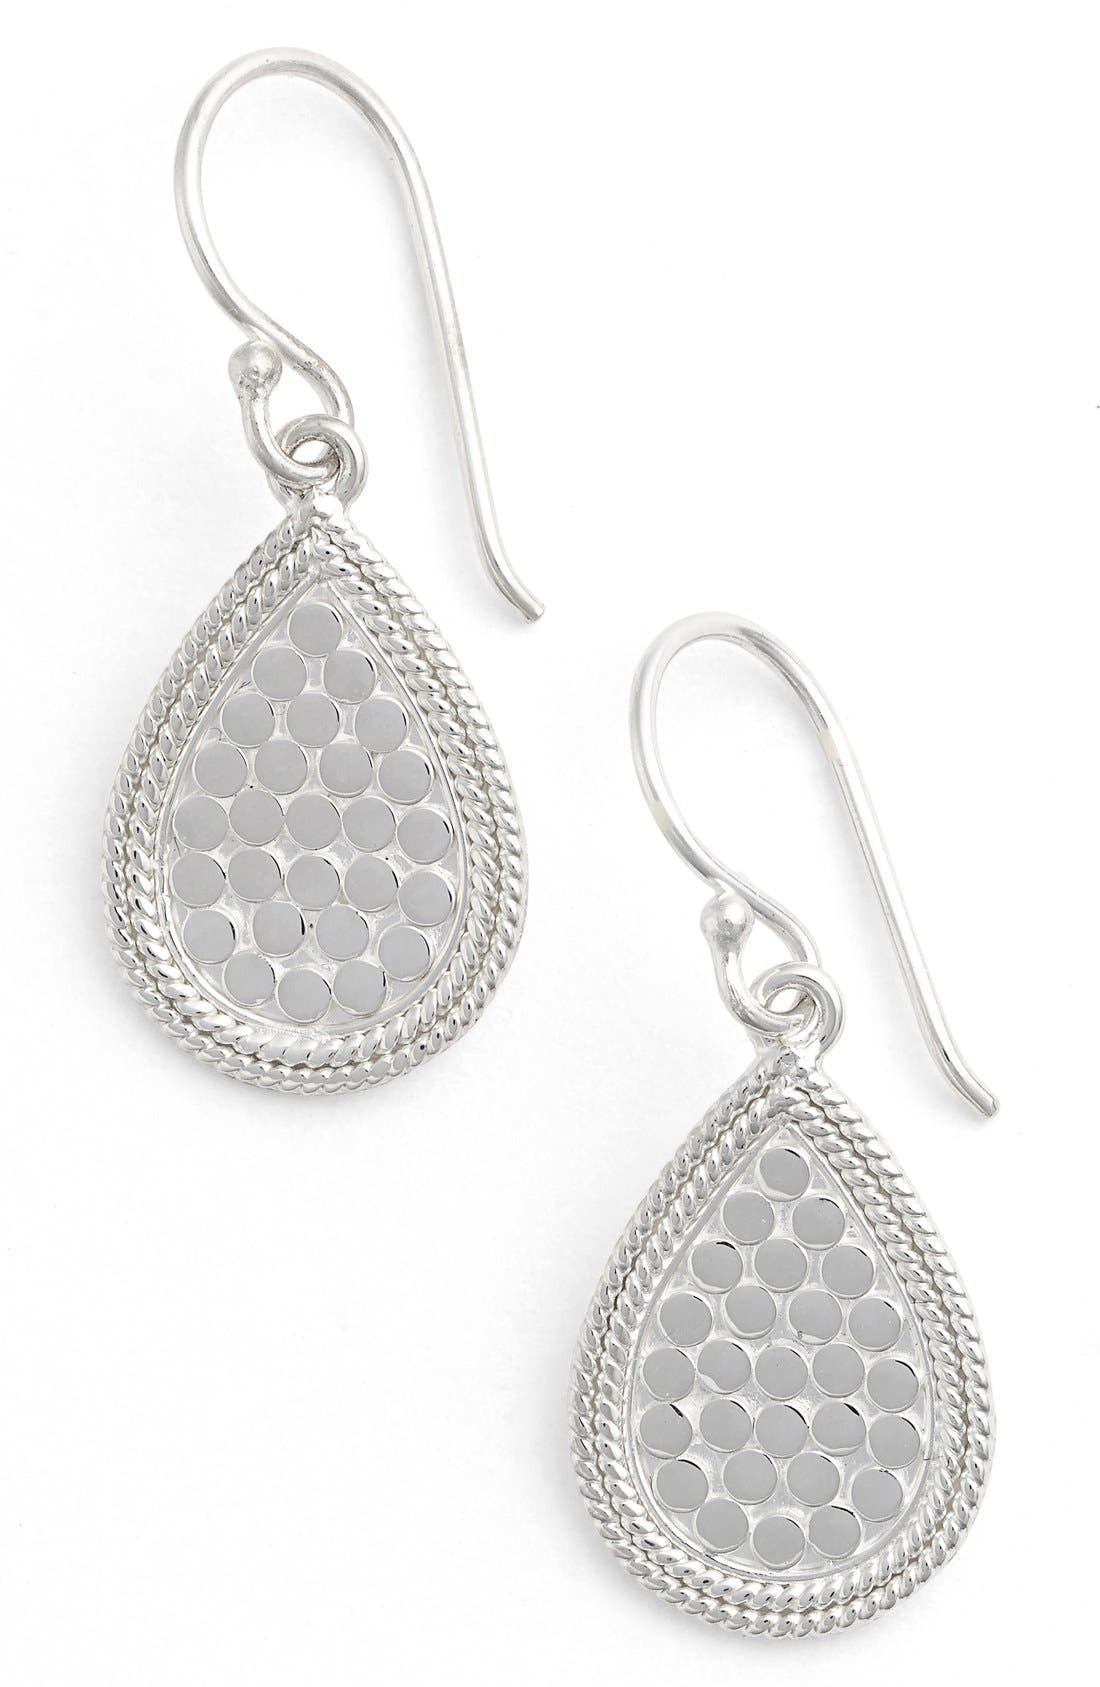 'Gili' Small Teardrop Earrings,                         Main,                         color, SILVER